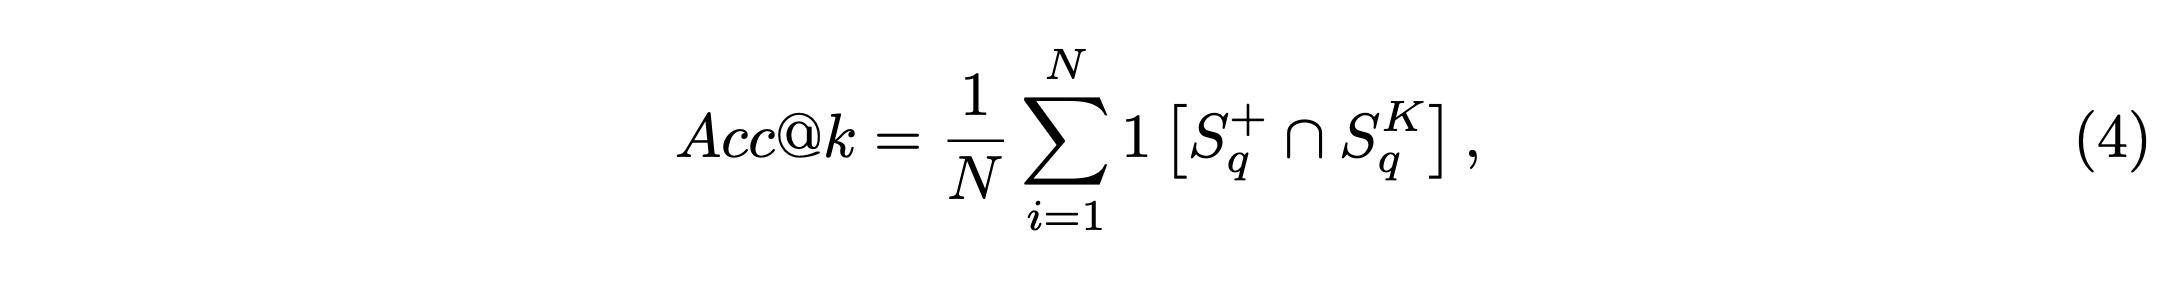 Accuracy@k (Acc@k) formula